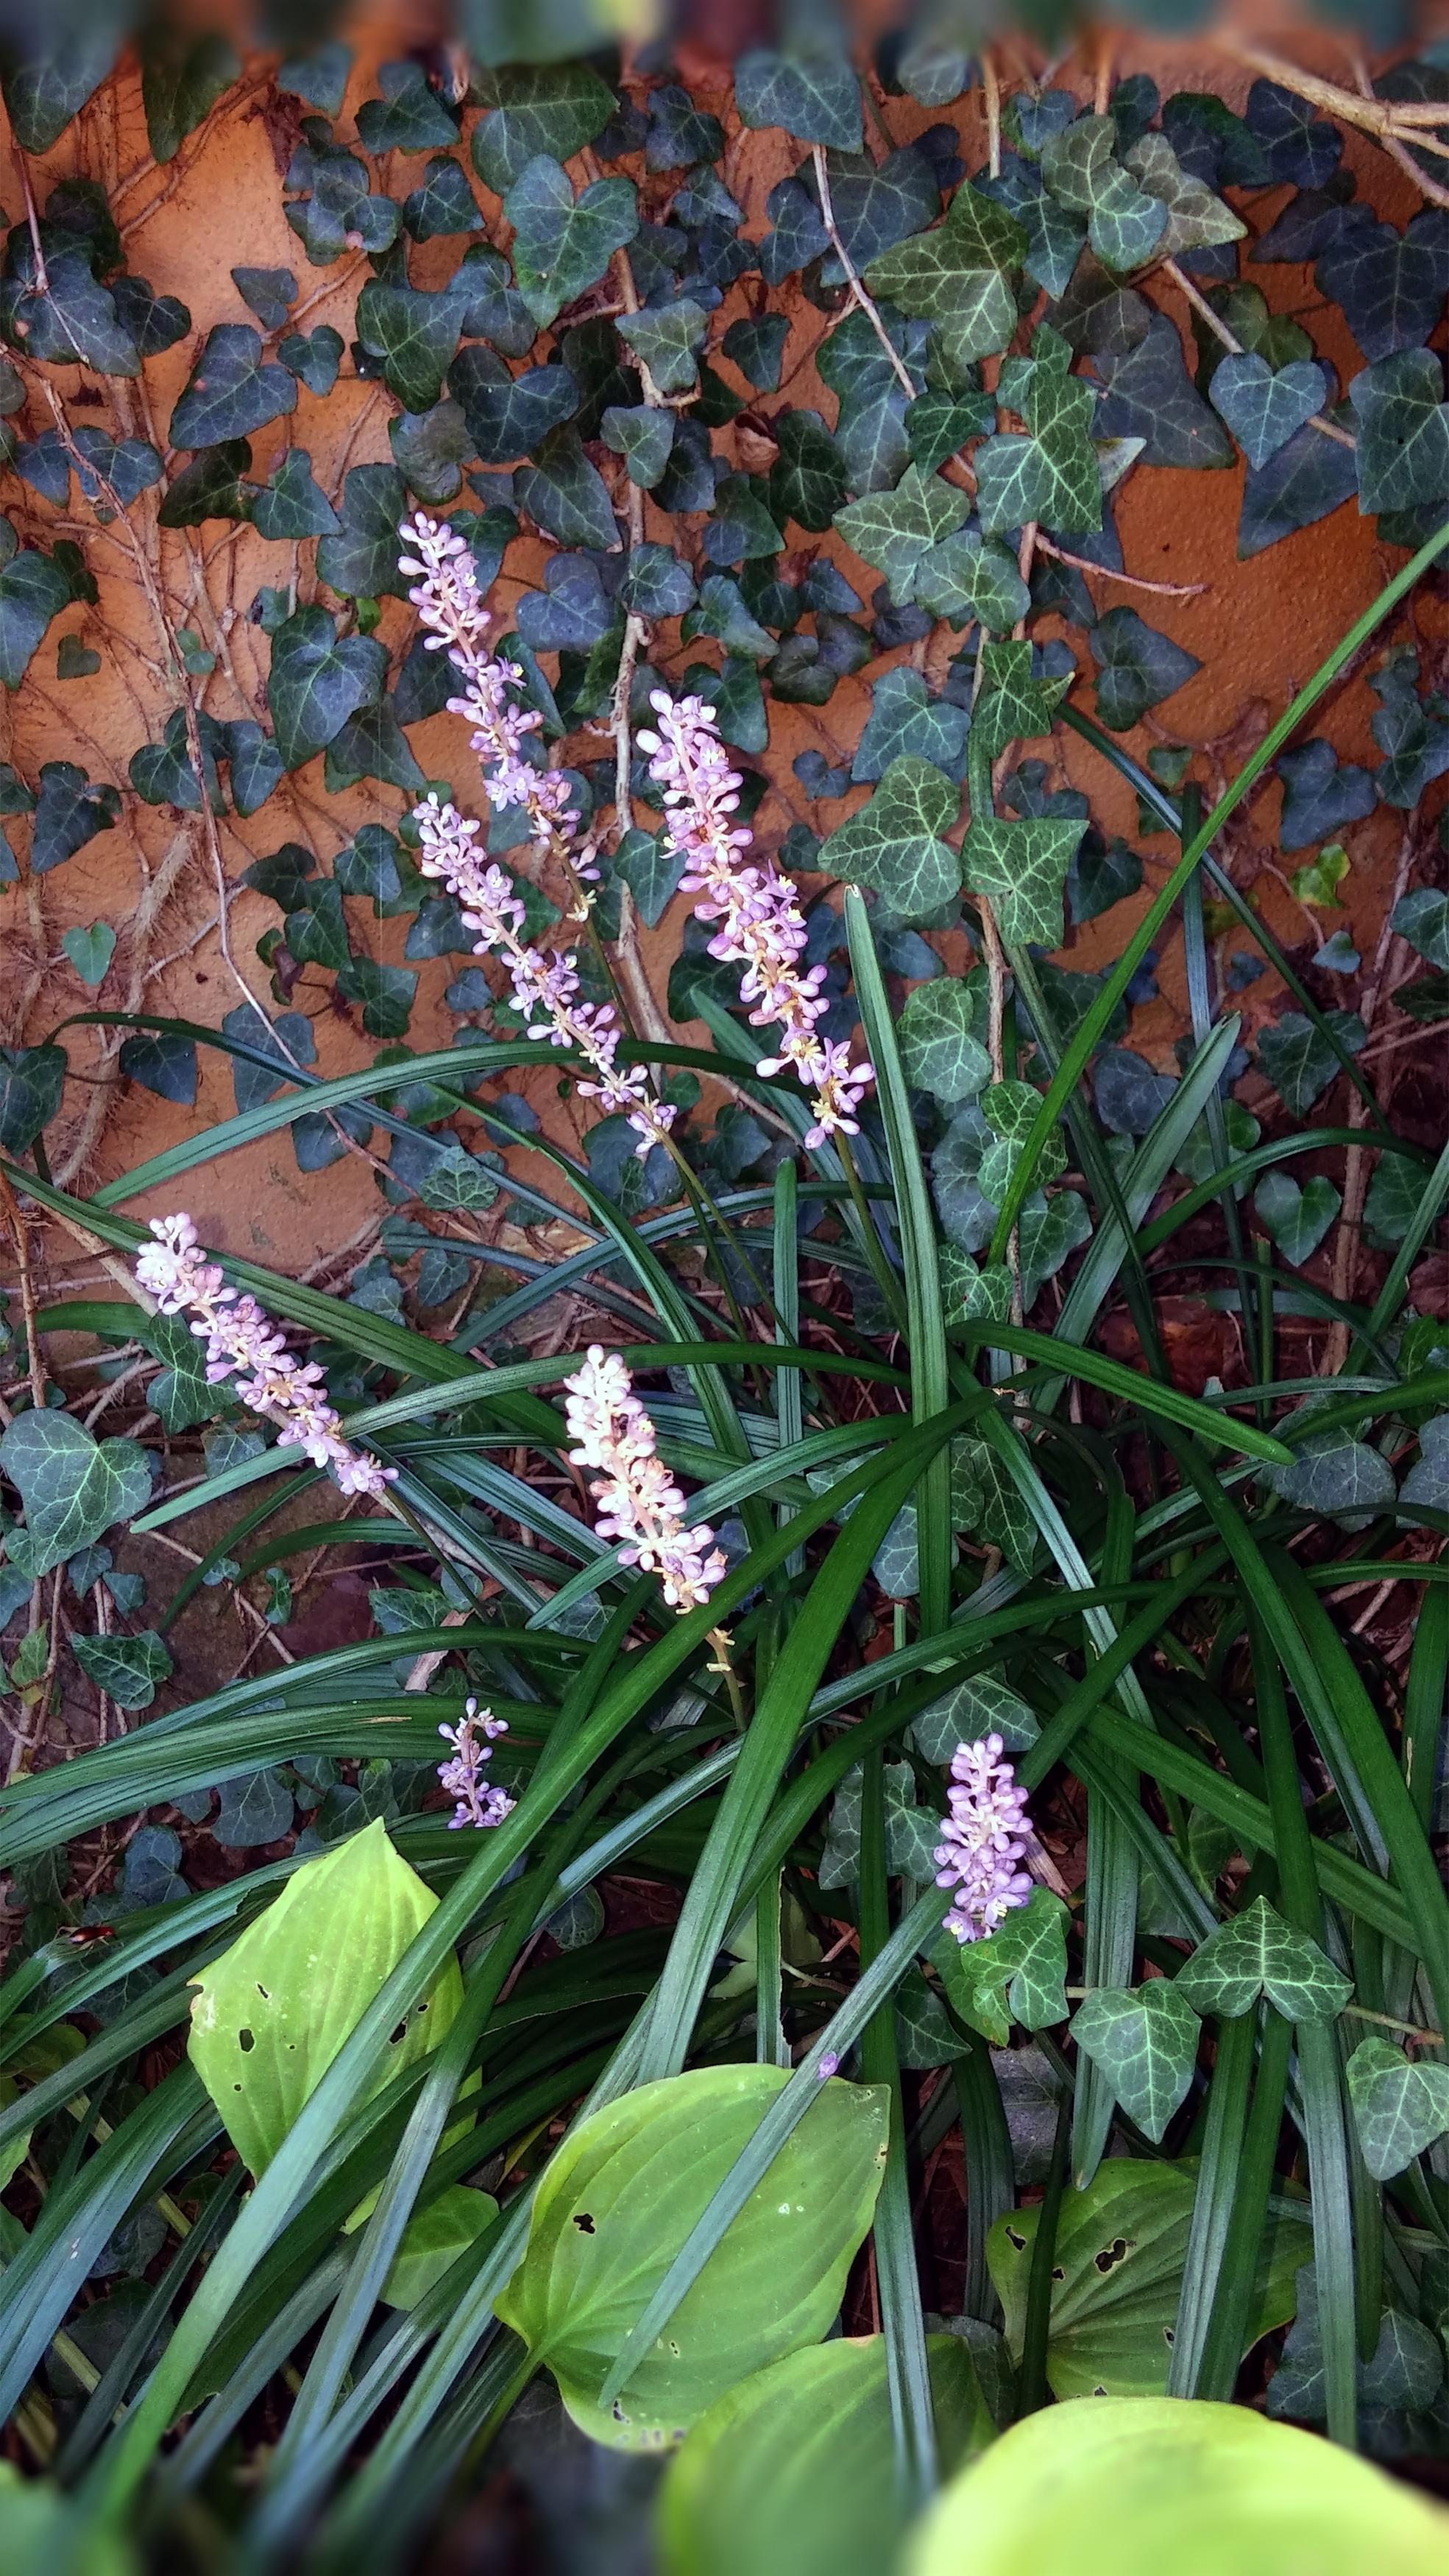 Free Images : nature, leaf, environment, foliage, green, botany ...